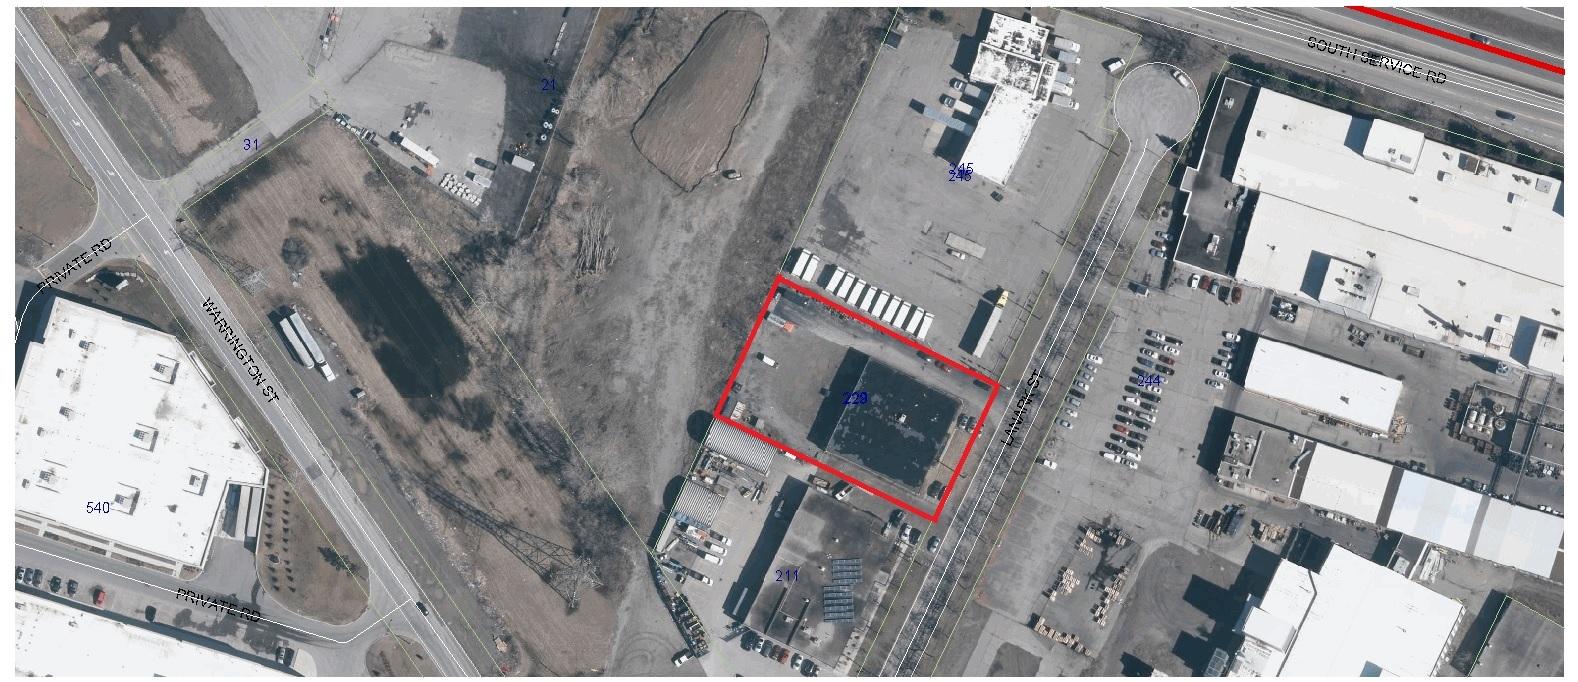 https://0901.nccdn.net/4_2/000/000/00f/7bd/229-Lanark-Aerial-1.jpg